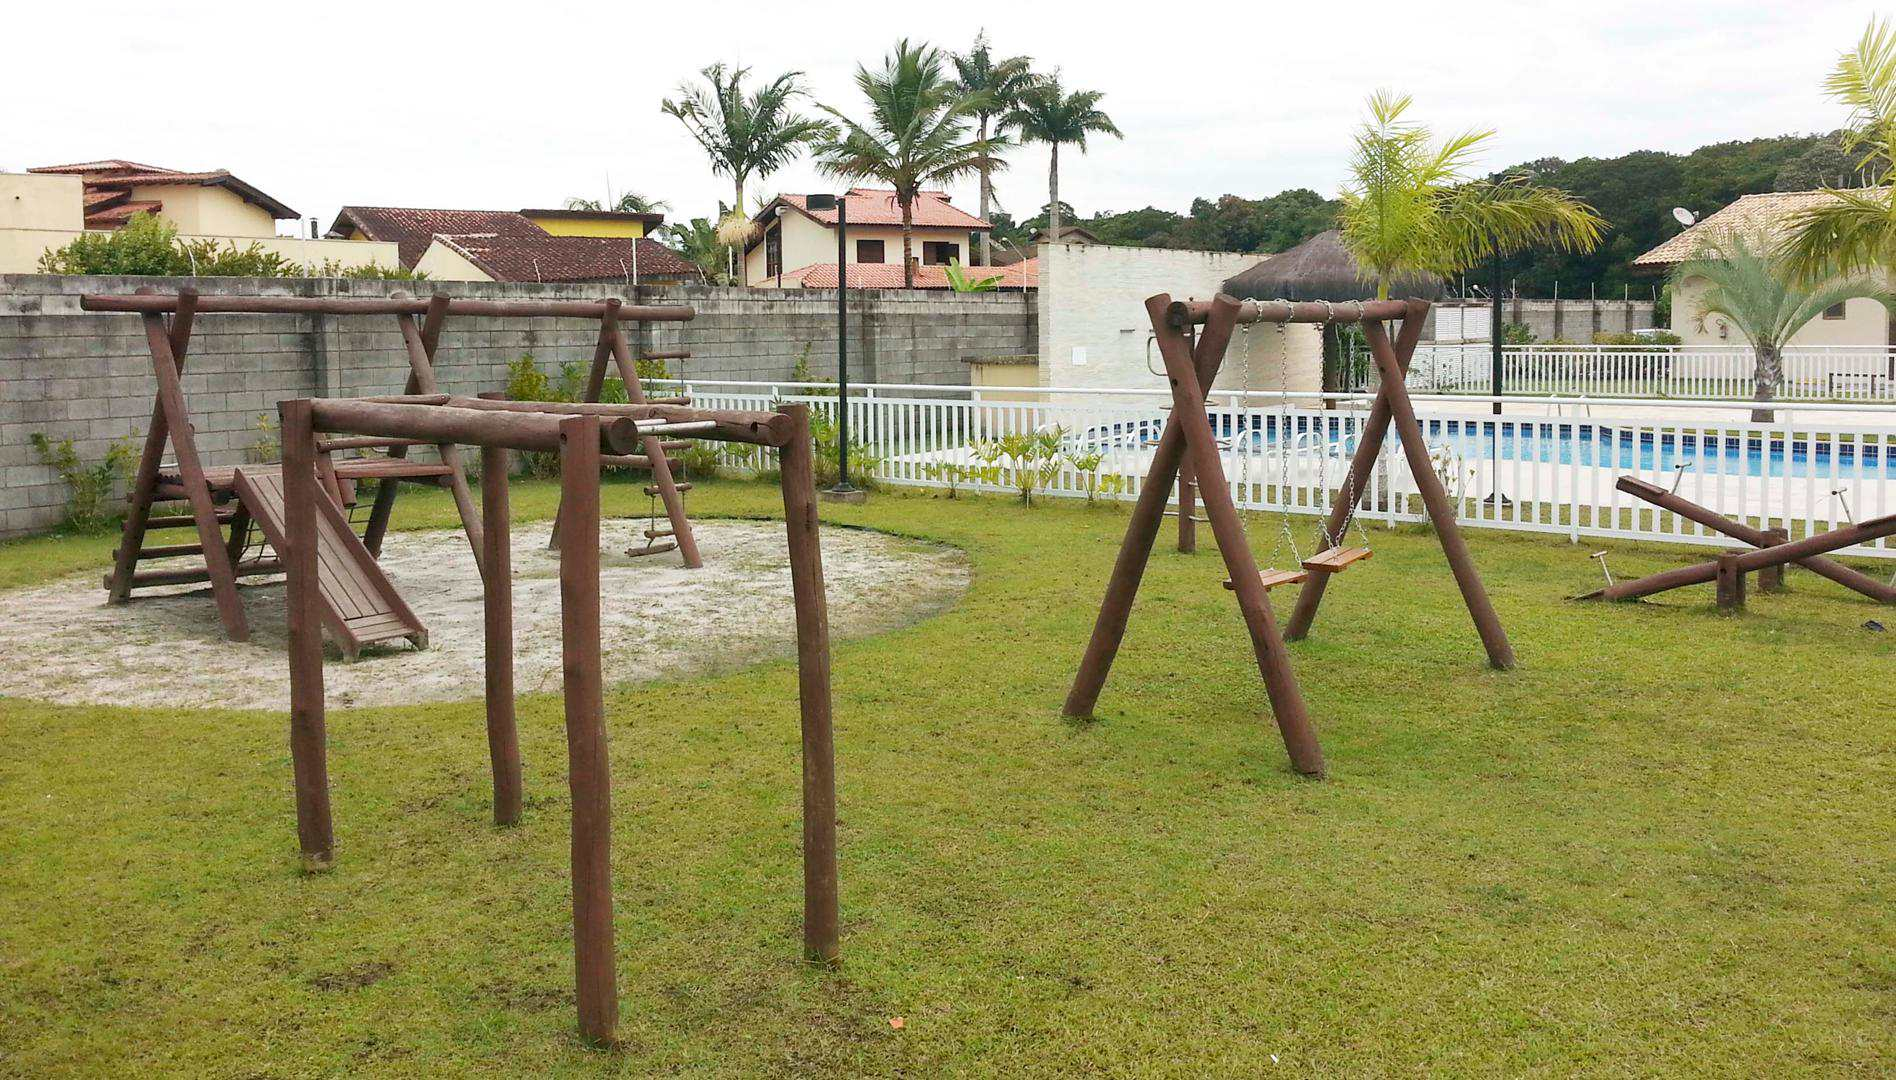 Bougainville 4 lazer 11